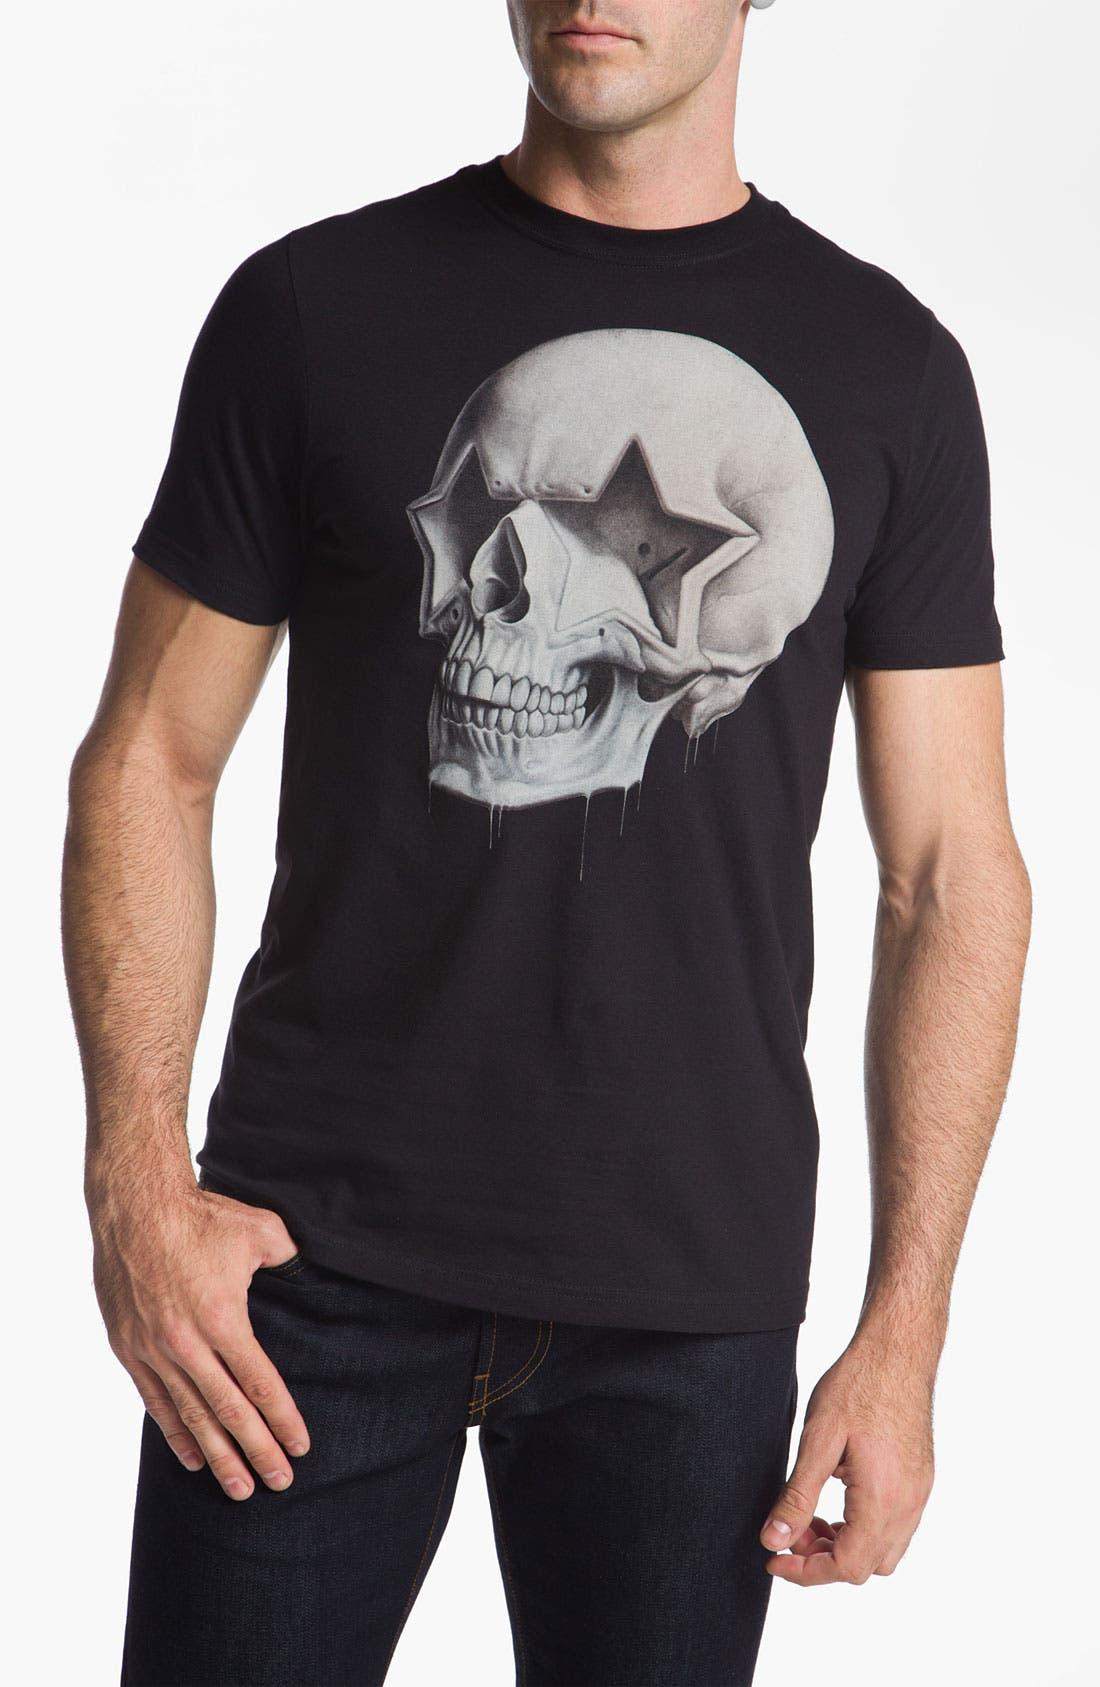 Alternate Image 1 Selected - Hurley 'Star Skull' Graphic T-Shirt